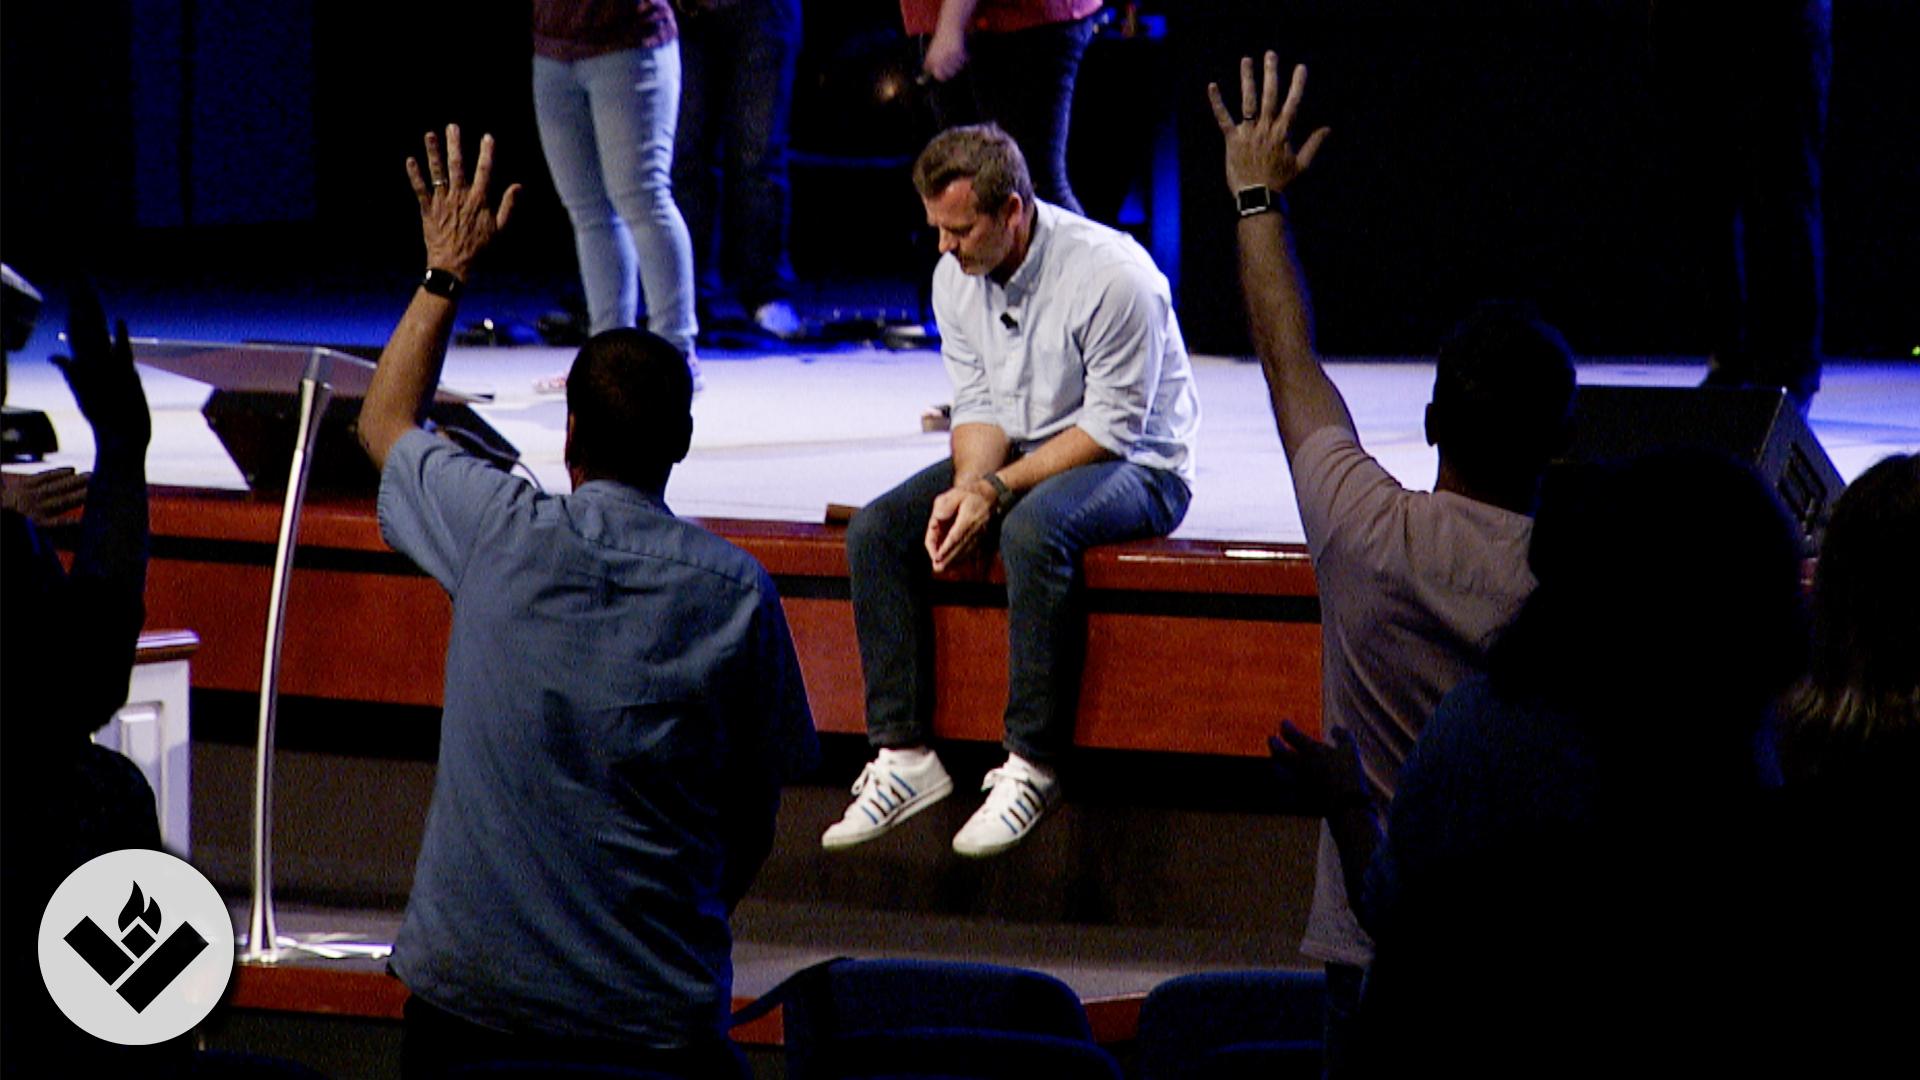 Does Prayer Change God?